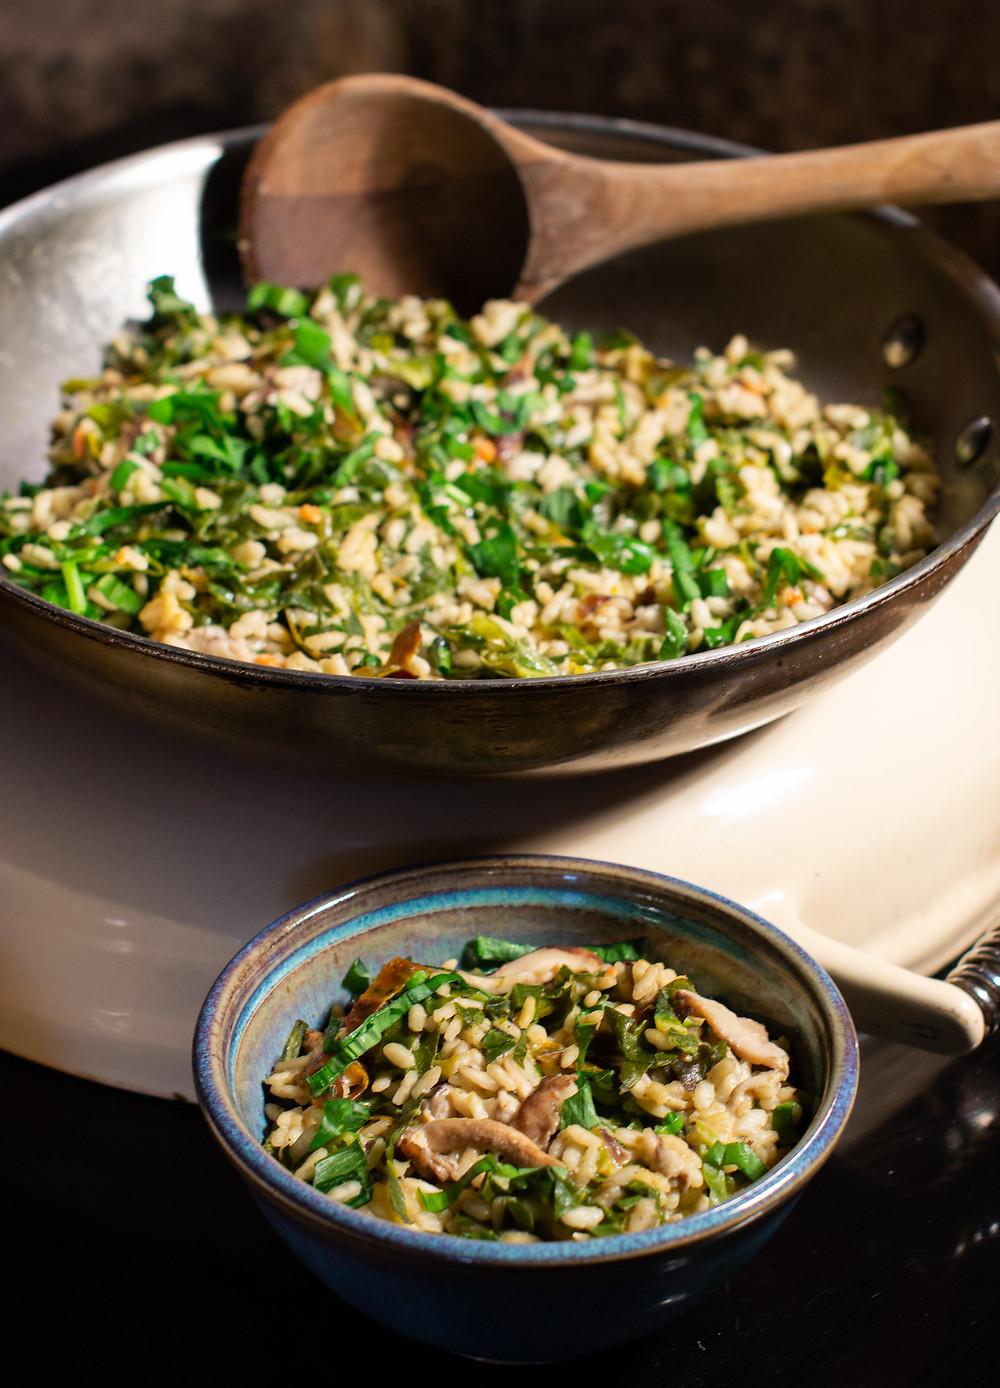 | Spring Green, Shiitake Mushroom and Wild Garlic Risotto | Vegan and gluten free recipe | The Dopey Vegan